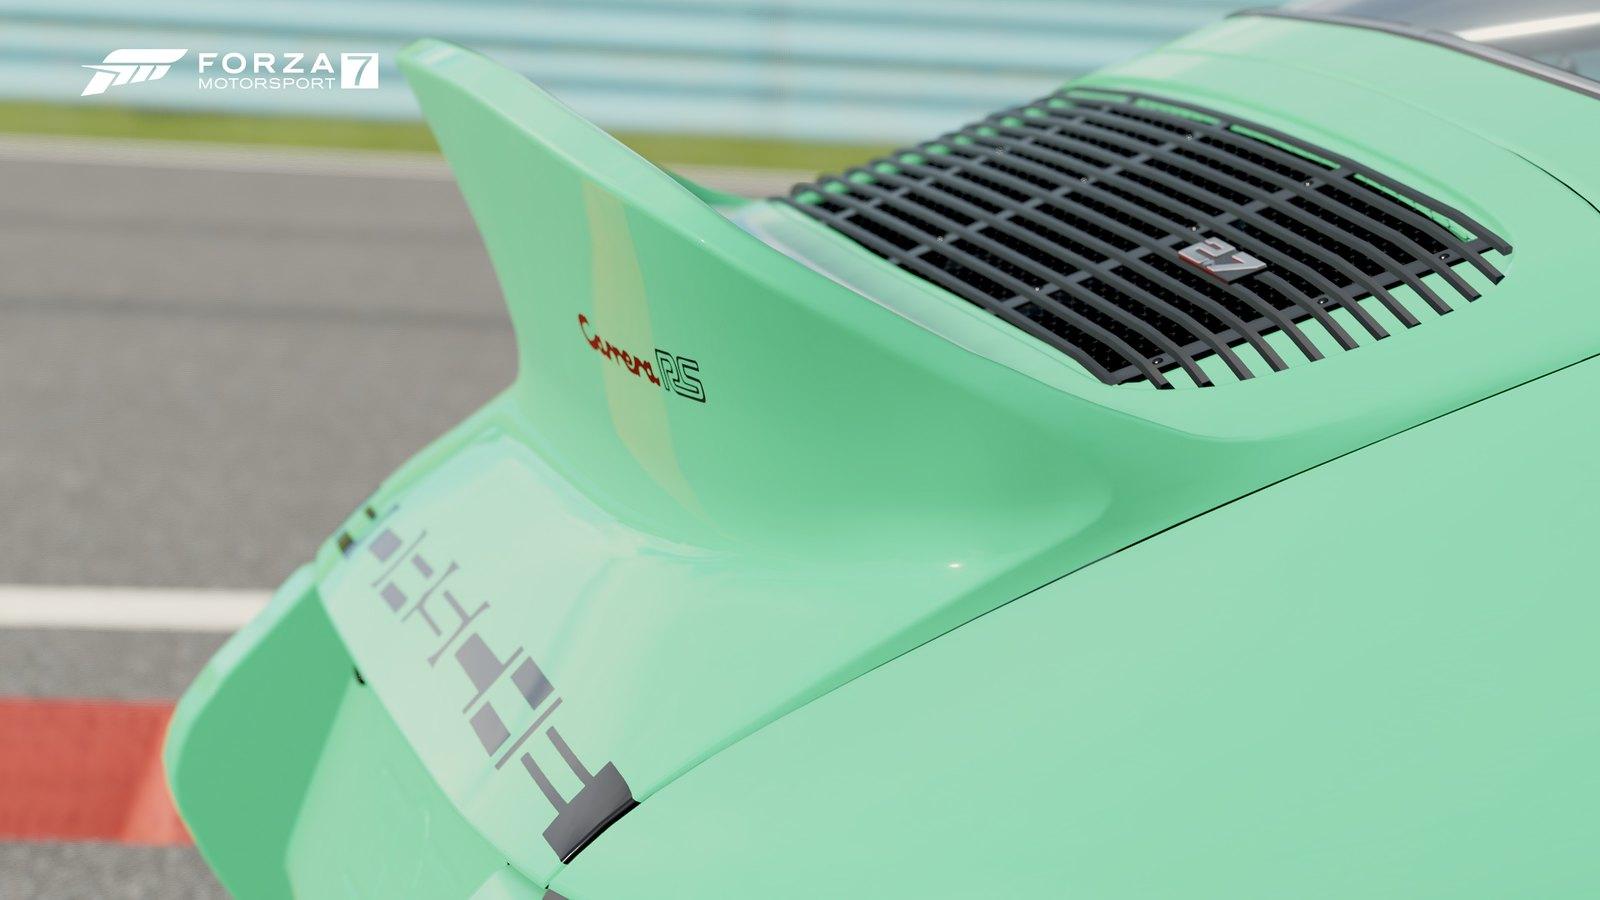 39866123914_eb4d046513_h ForzaMotorsport.fr